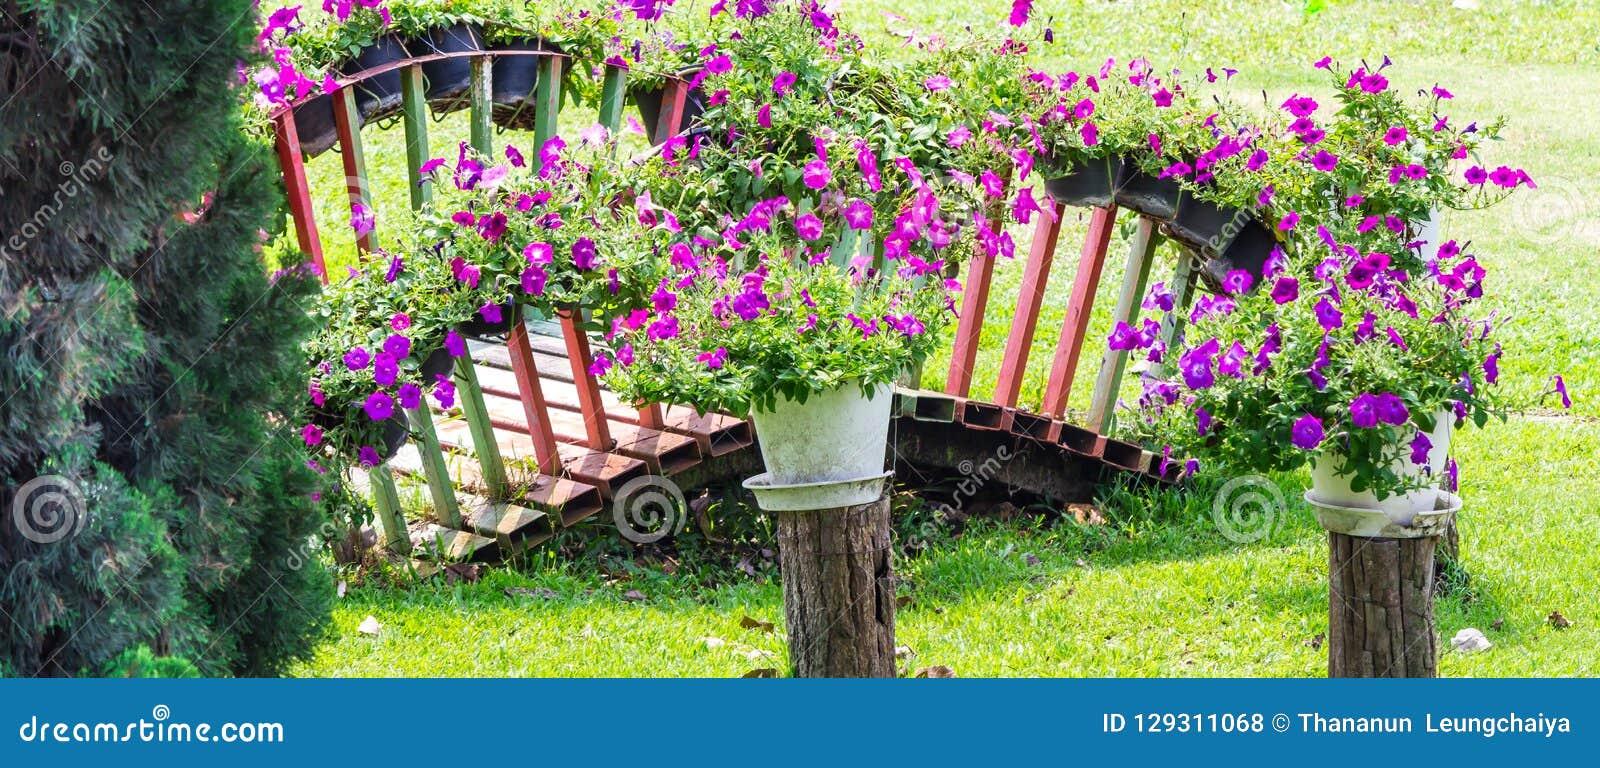 Concept And Idea Cozy Home Flower Garden On Summer Stock